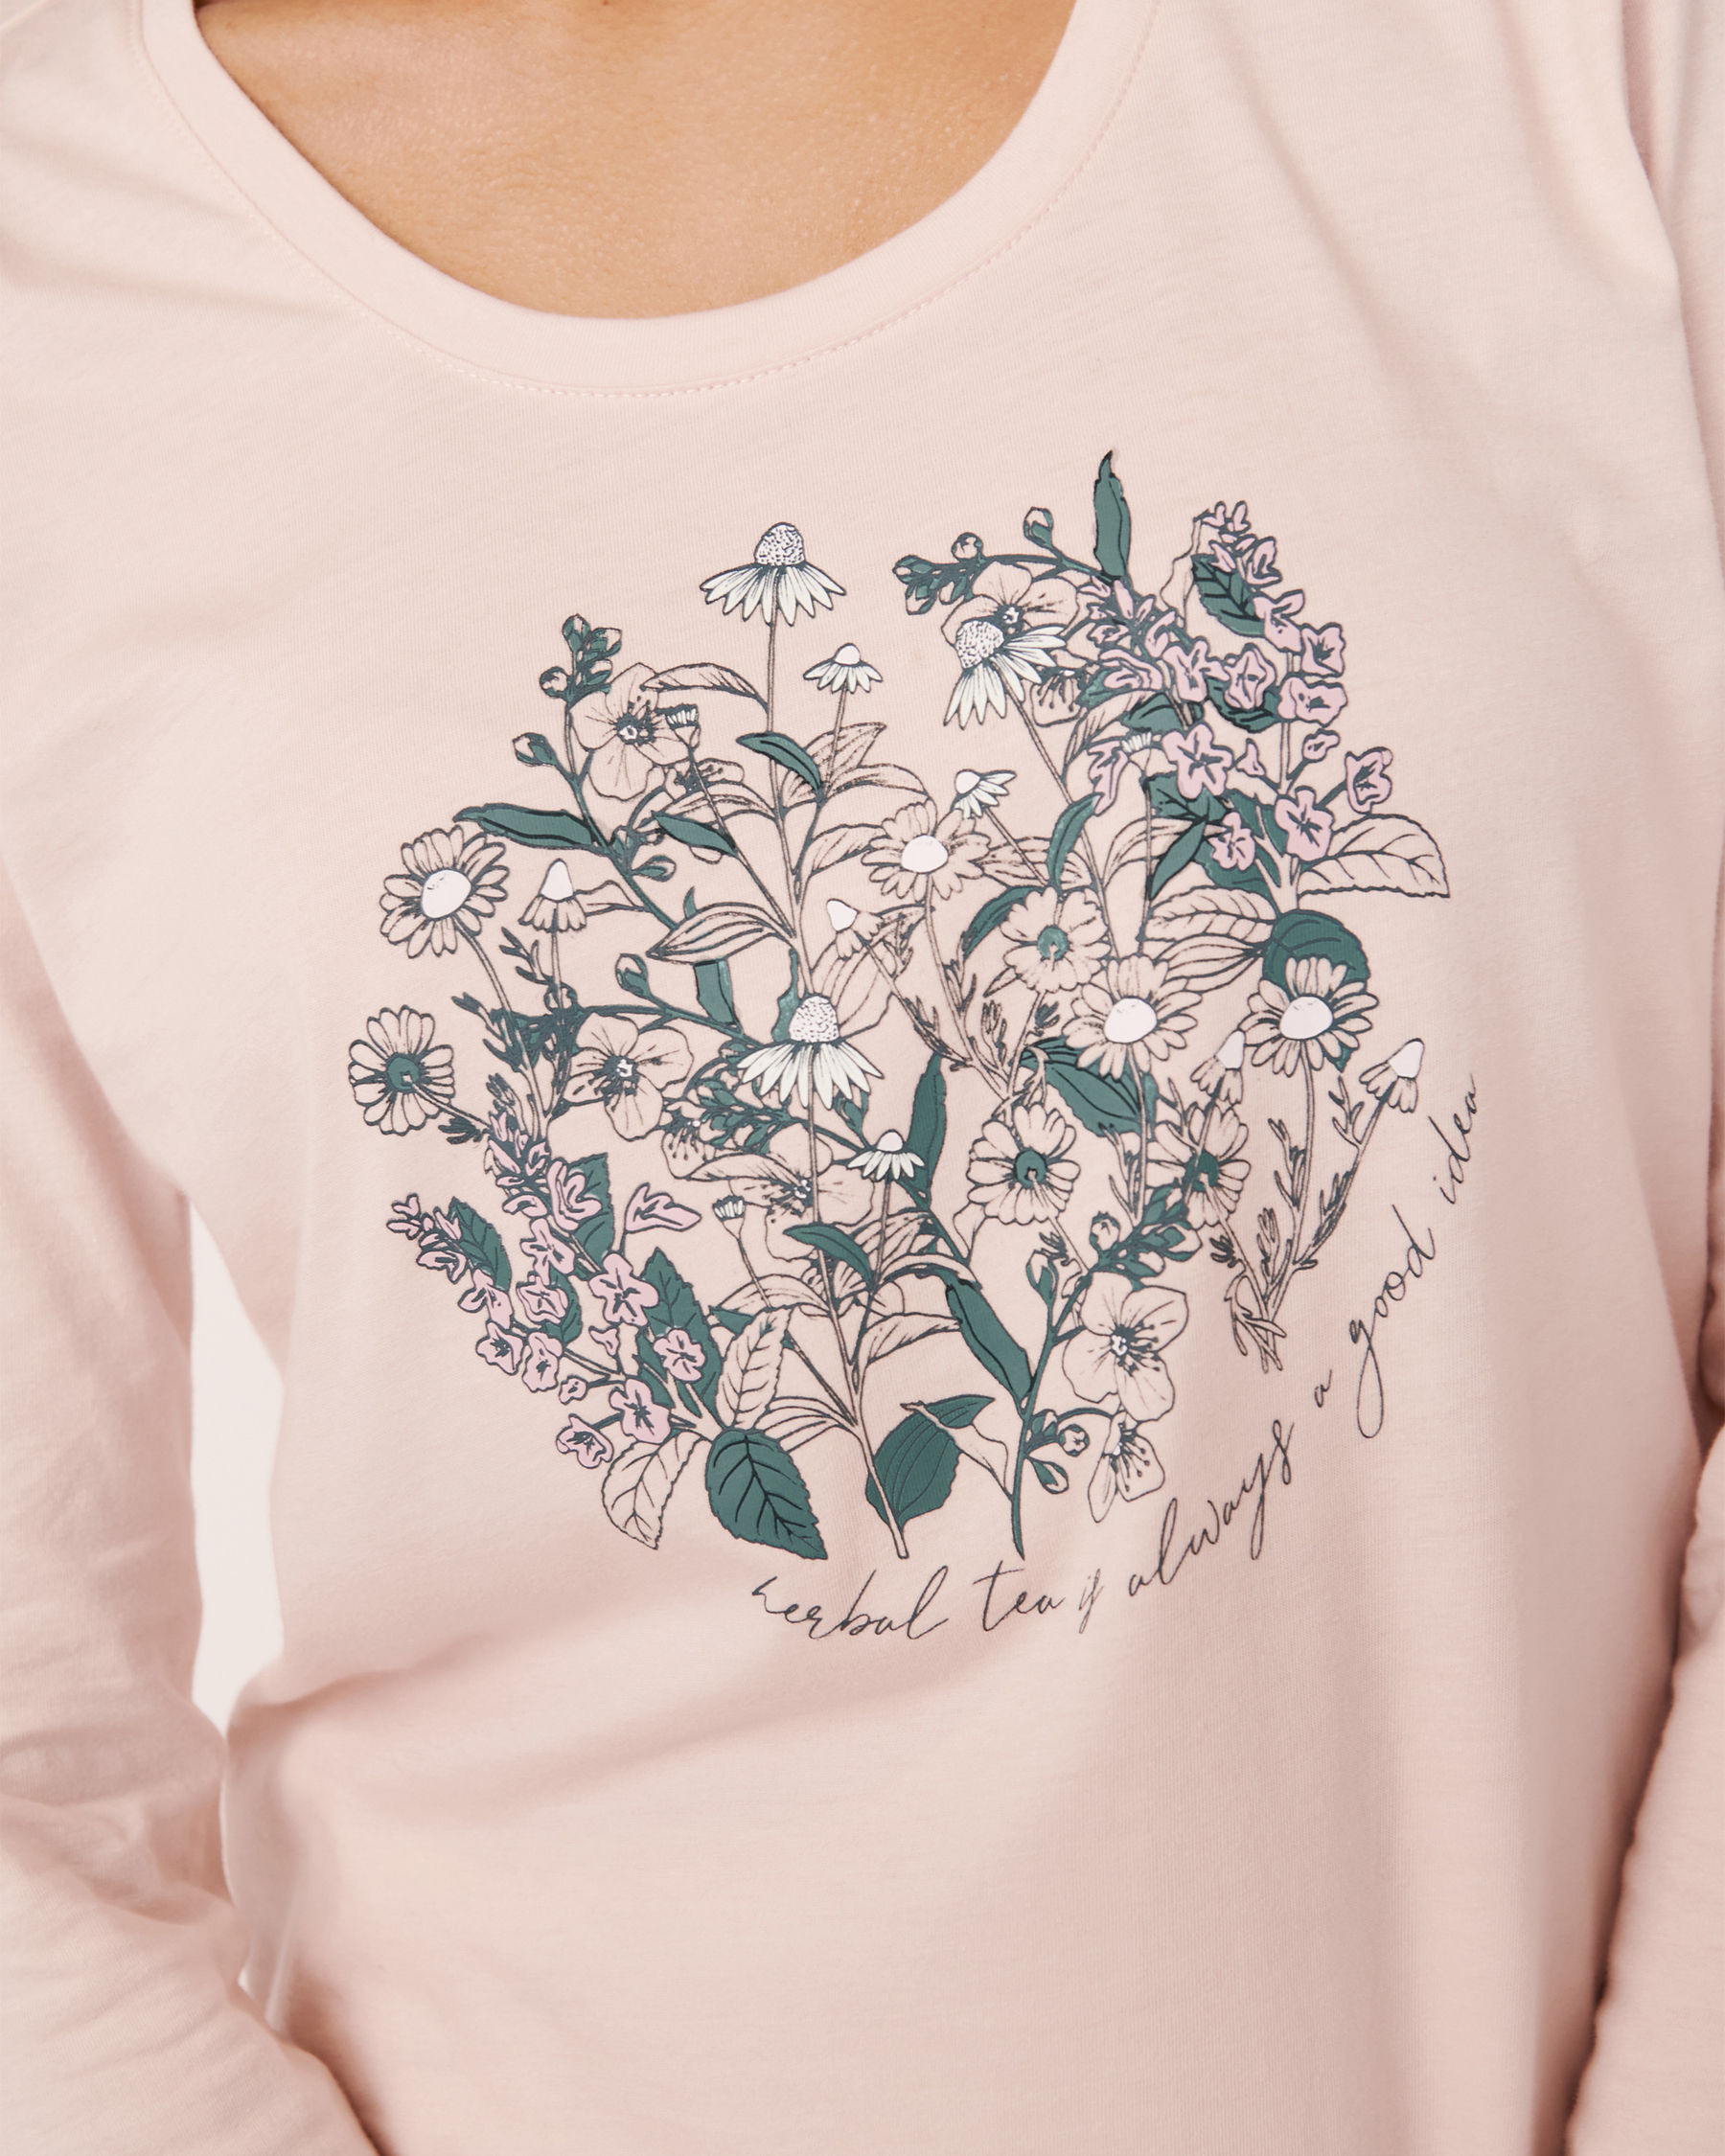 LA VIE EN ROSE Scoop Neck Long Sleeve Shirt Light pink 40100182 - View2